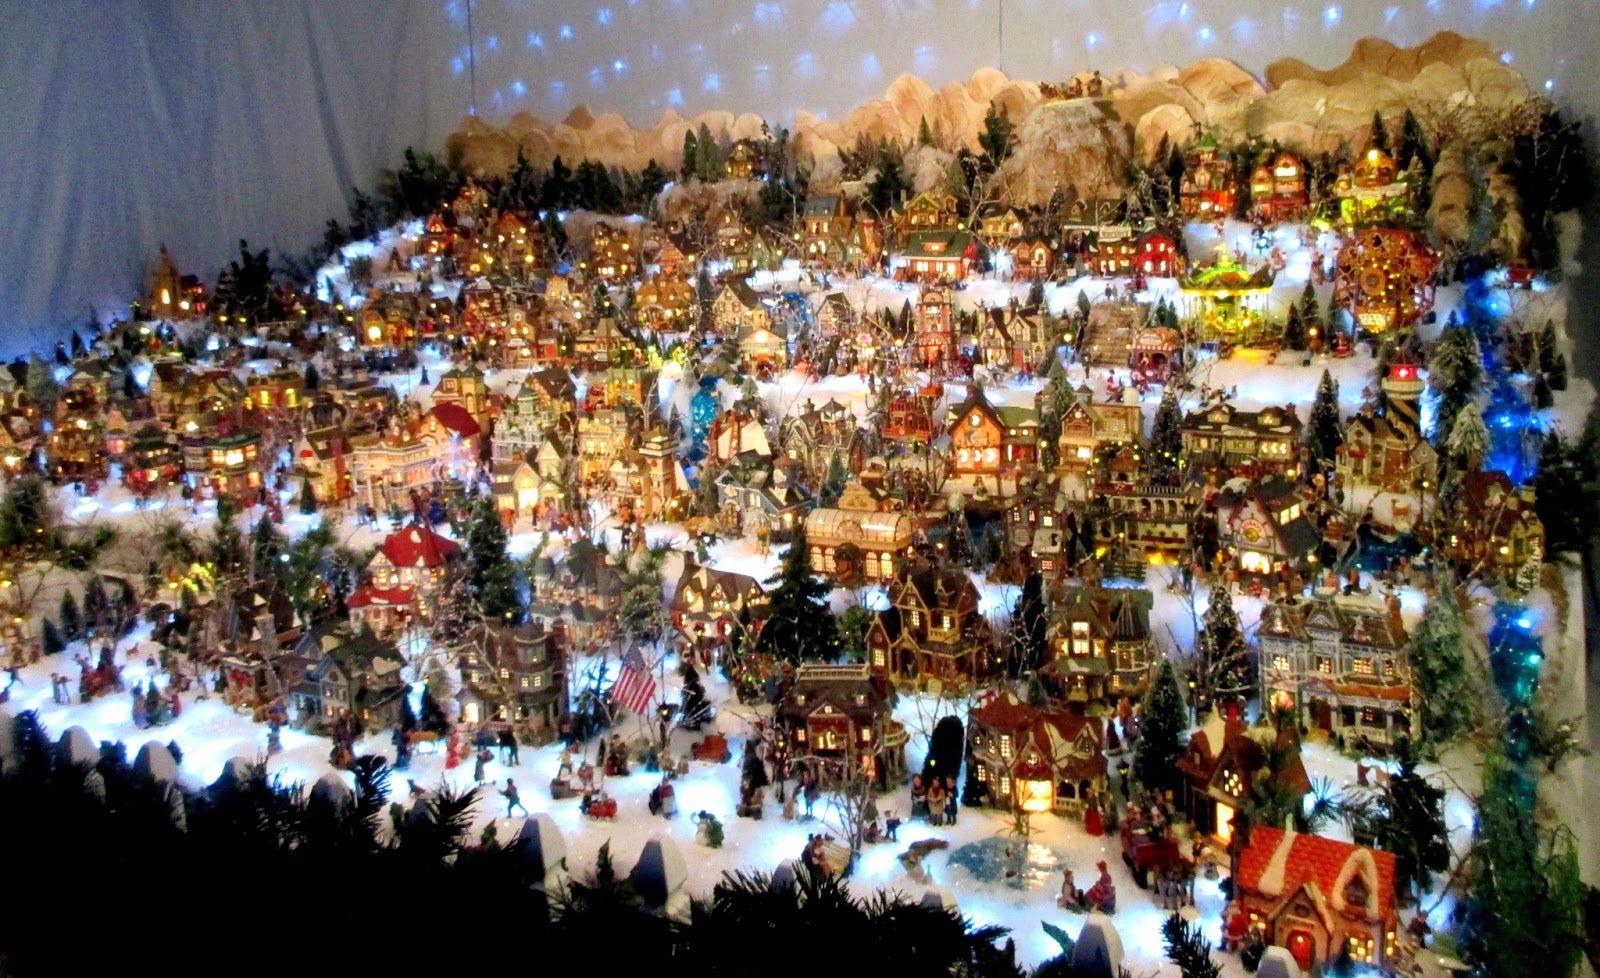 christmas village displays - Google Search